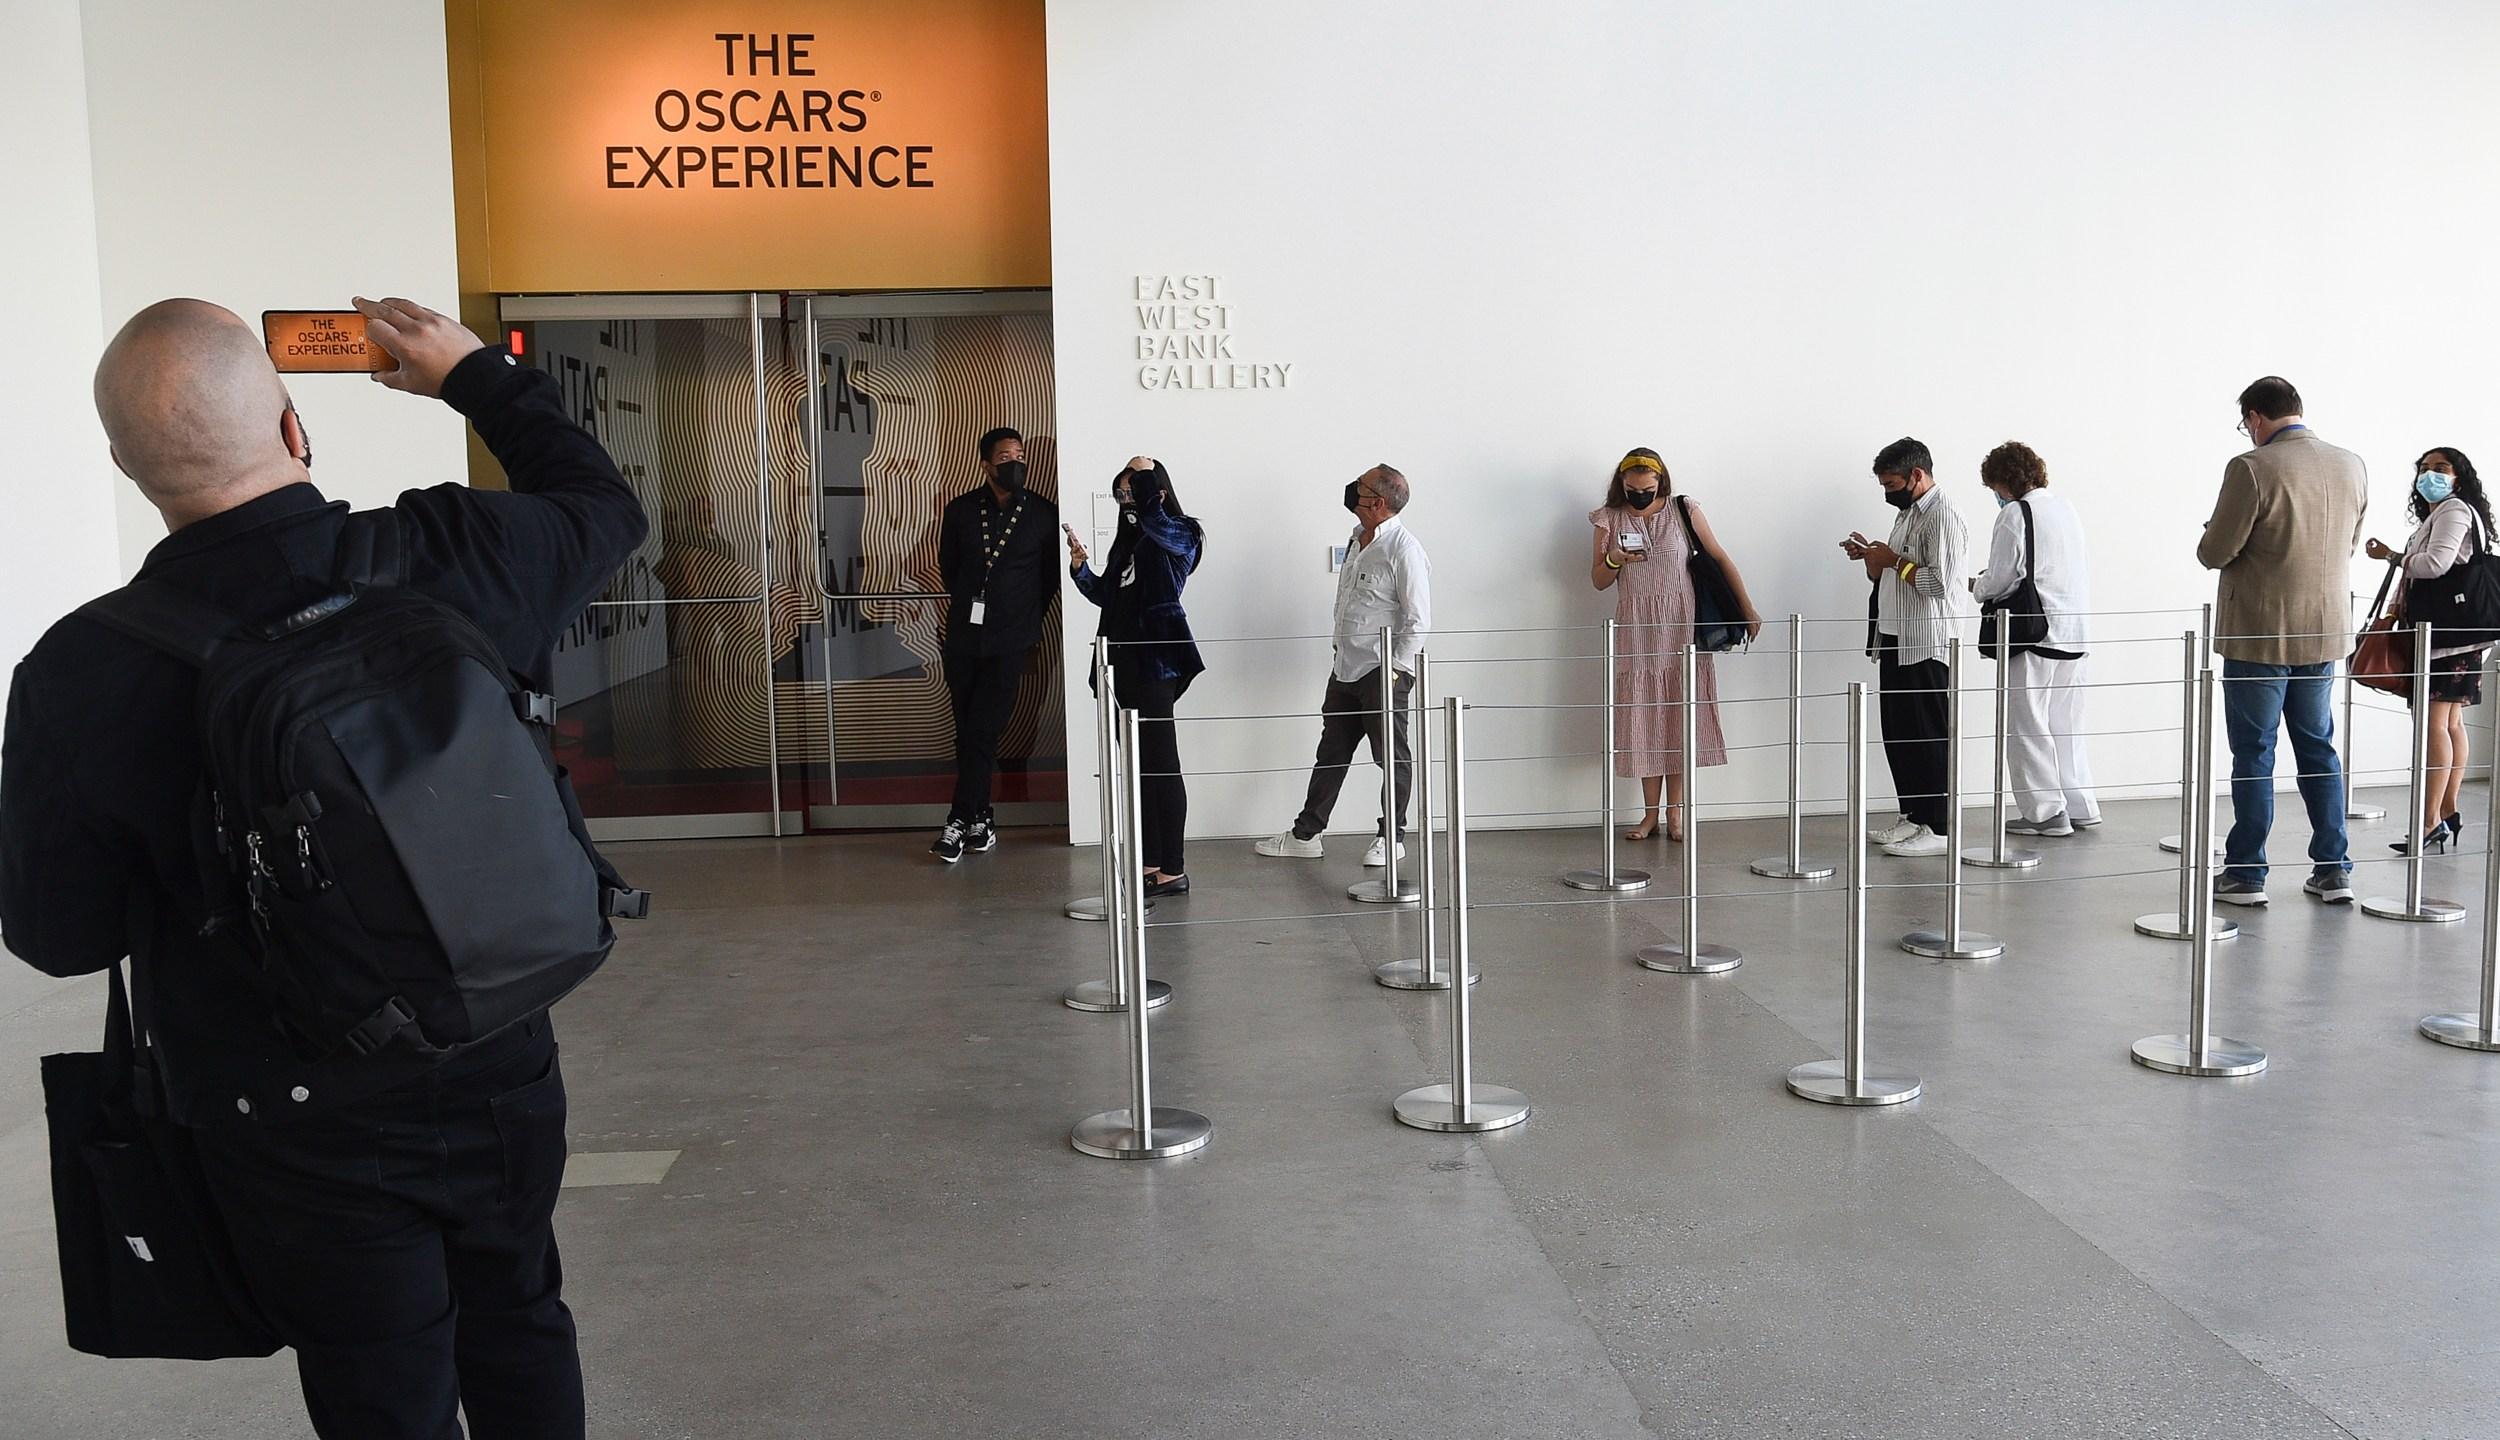 The Oscars Experience Exhibit